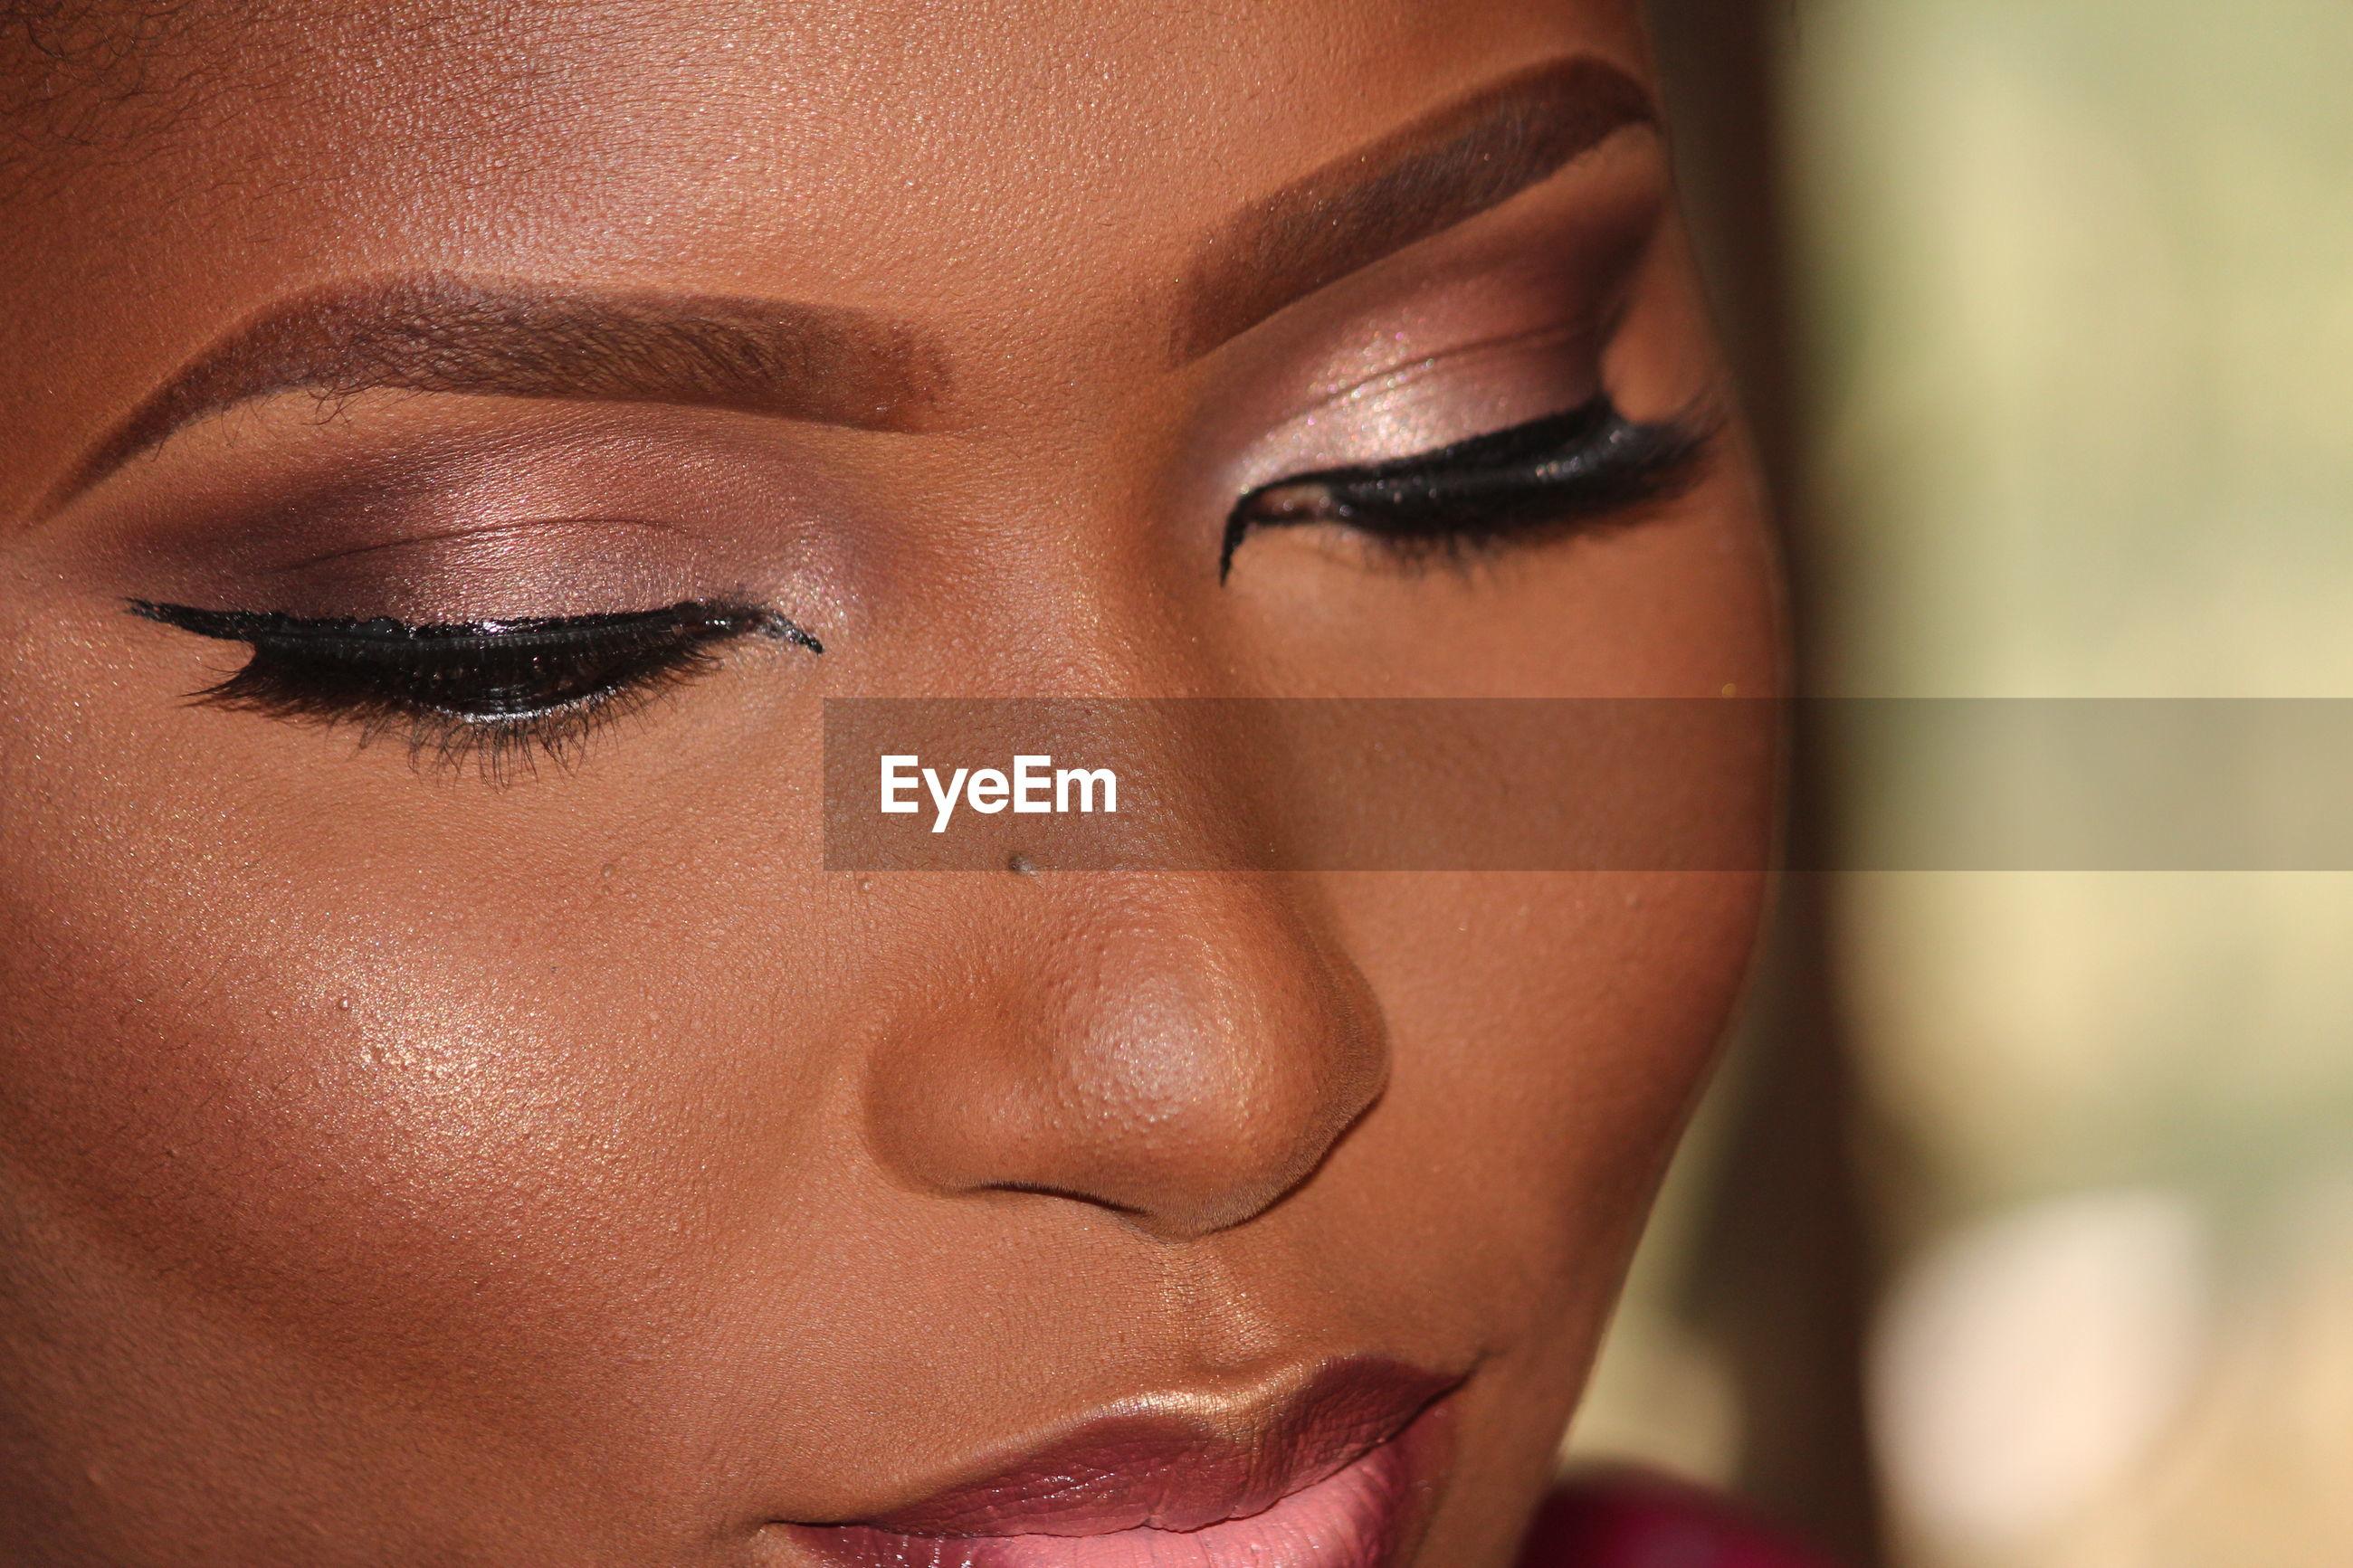 Close-up of woman wearing make-up at home